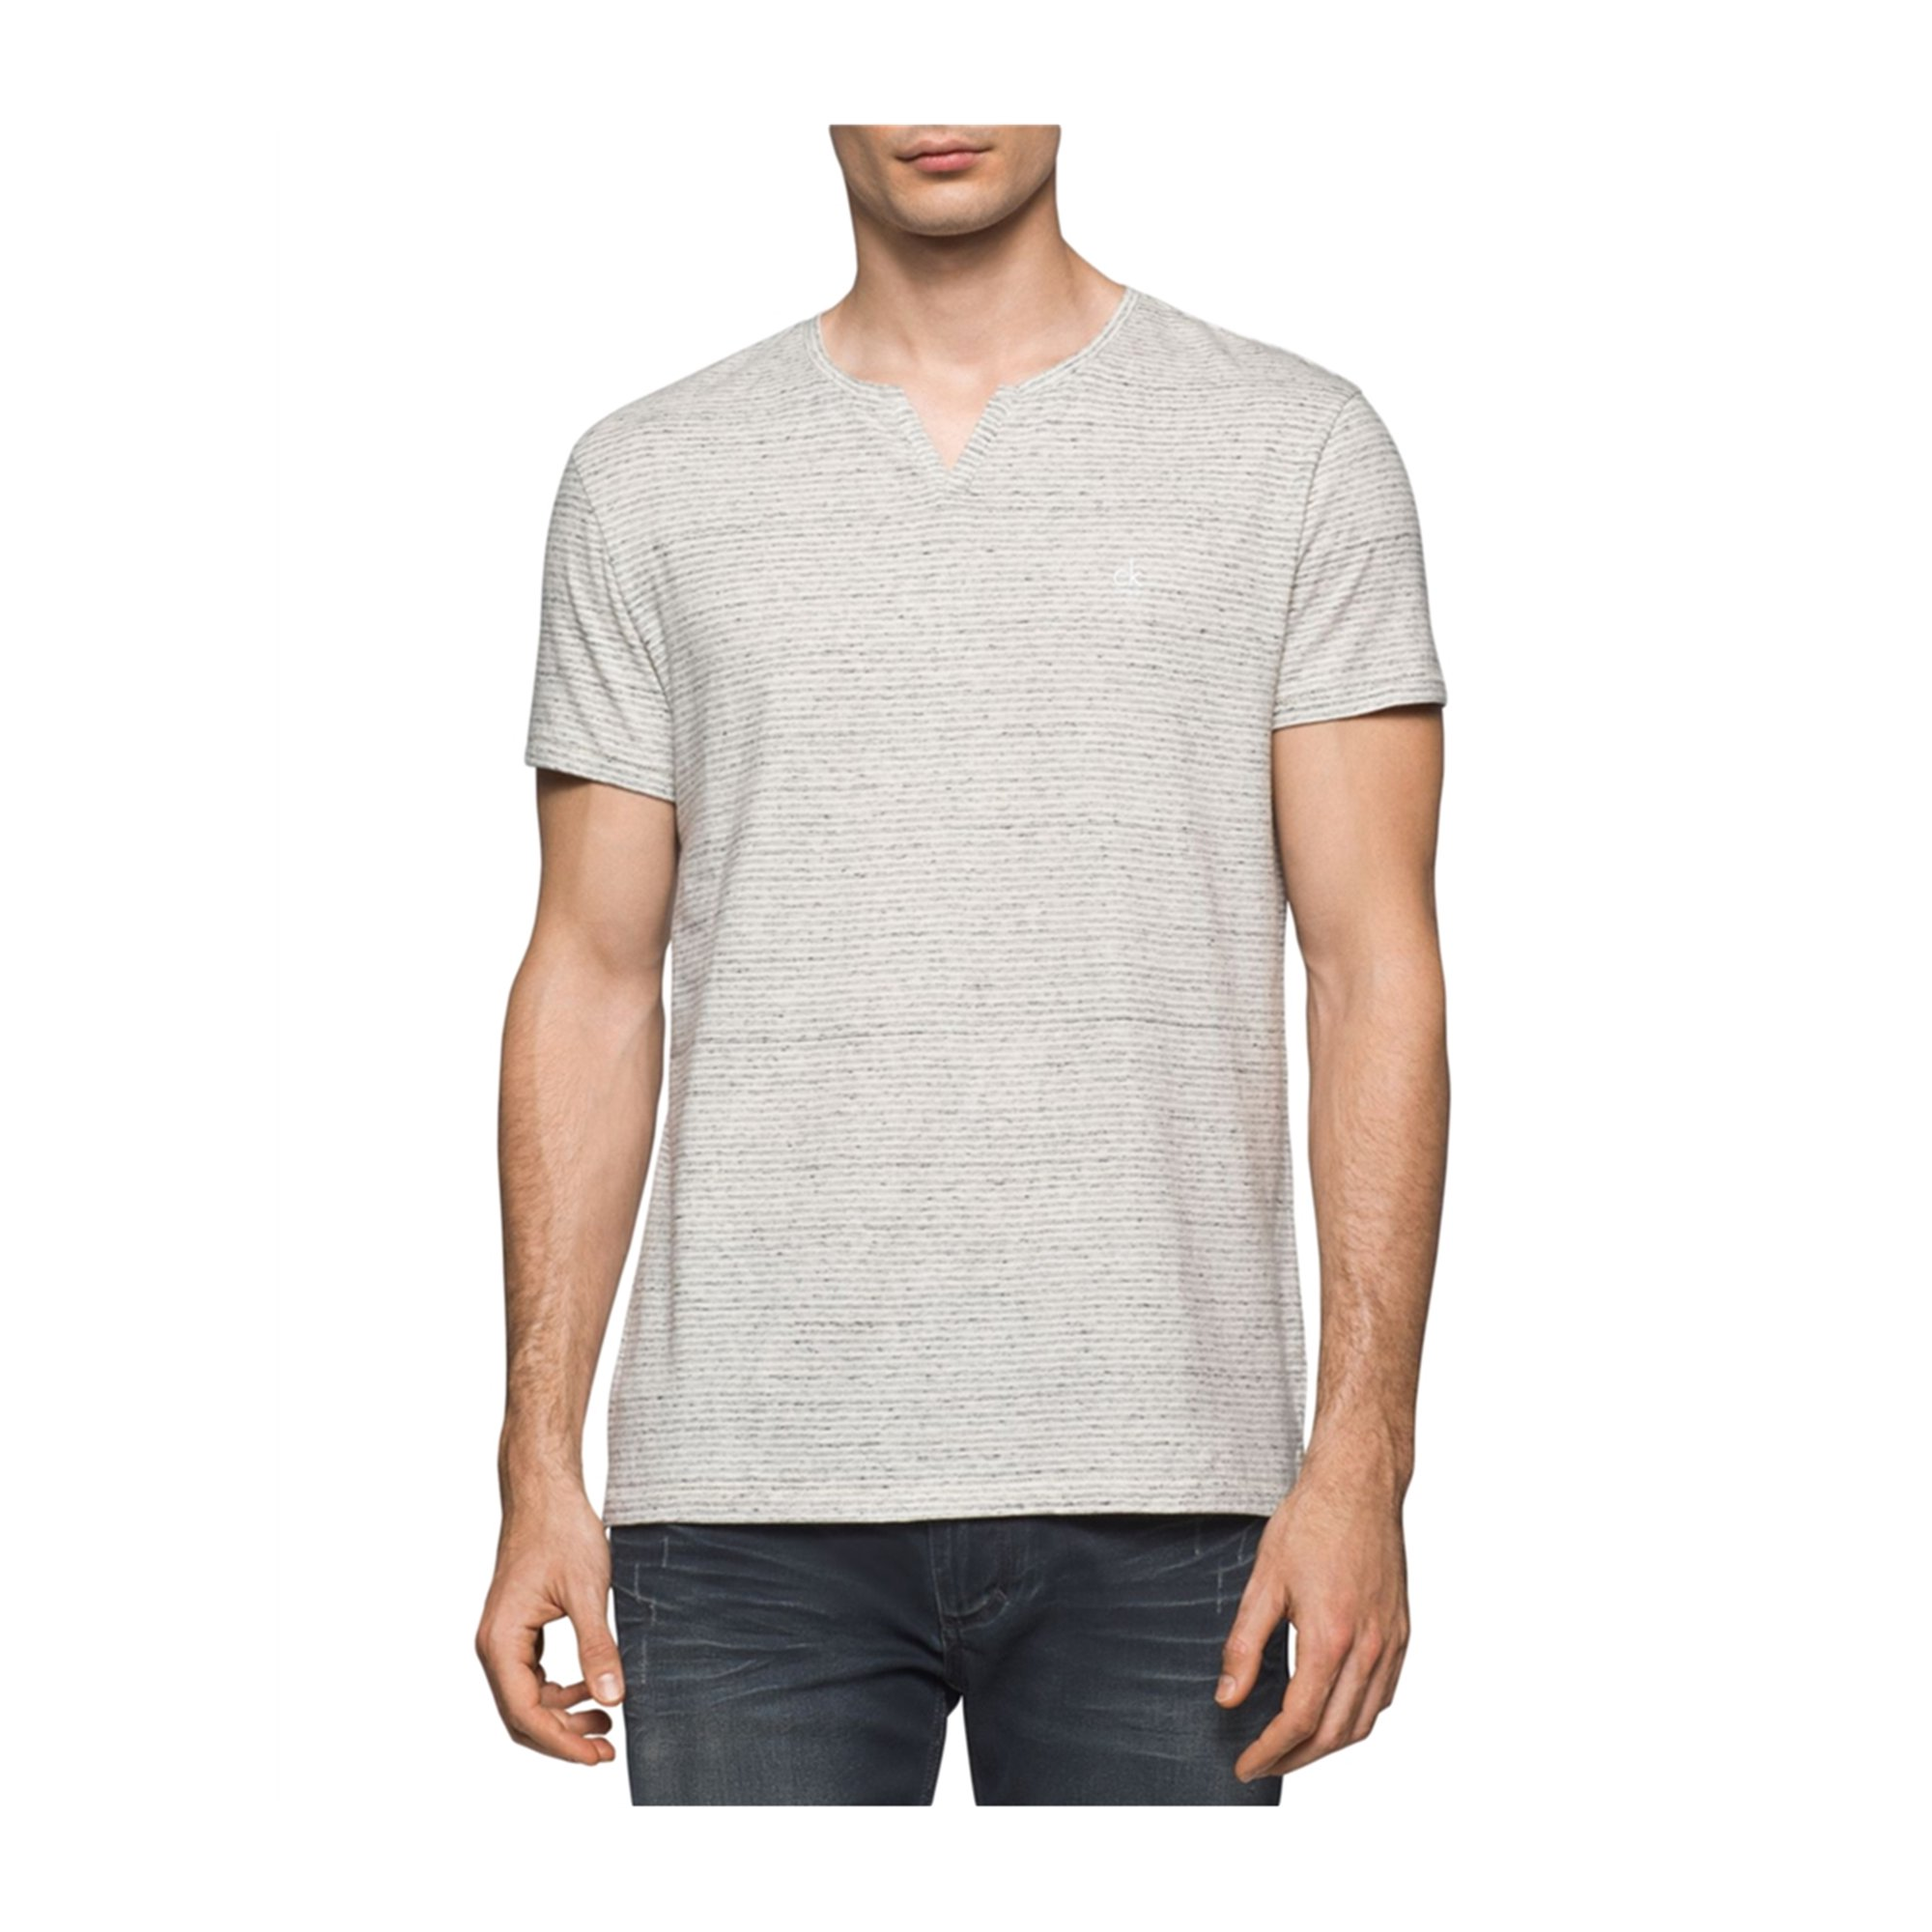 09999362e4a8 Calvin Klein Mens Heathered Striped Embellished T-Shirt white 2XL | Walmart  Canada